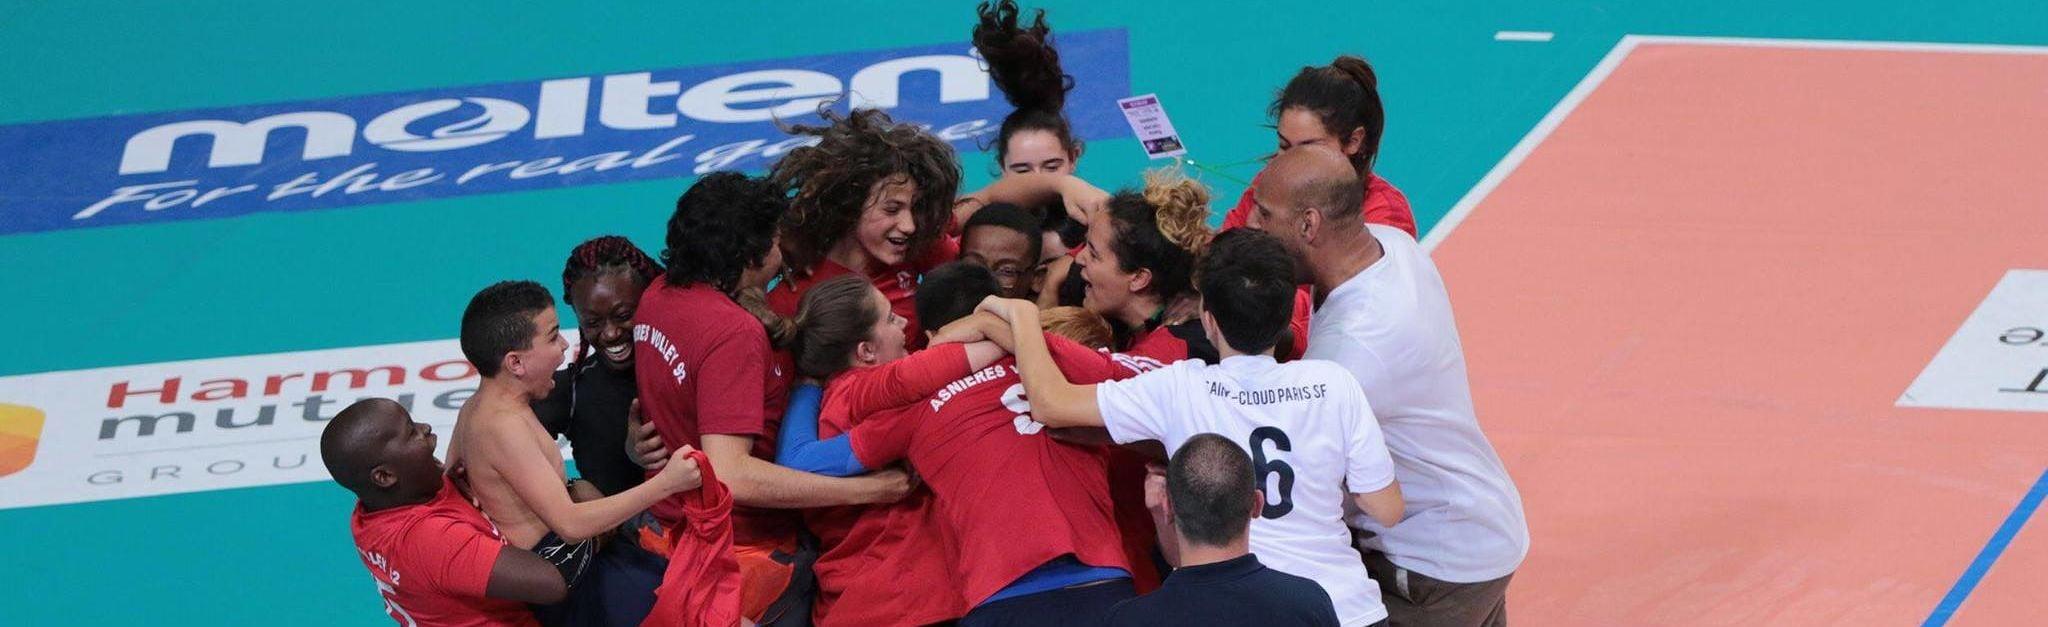 Asnieres Volley 92